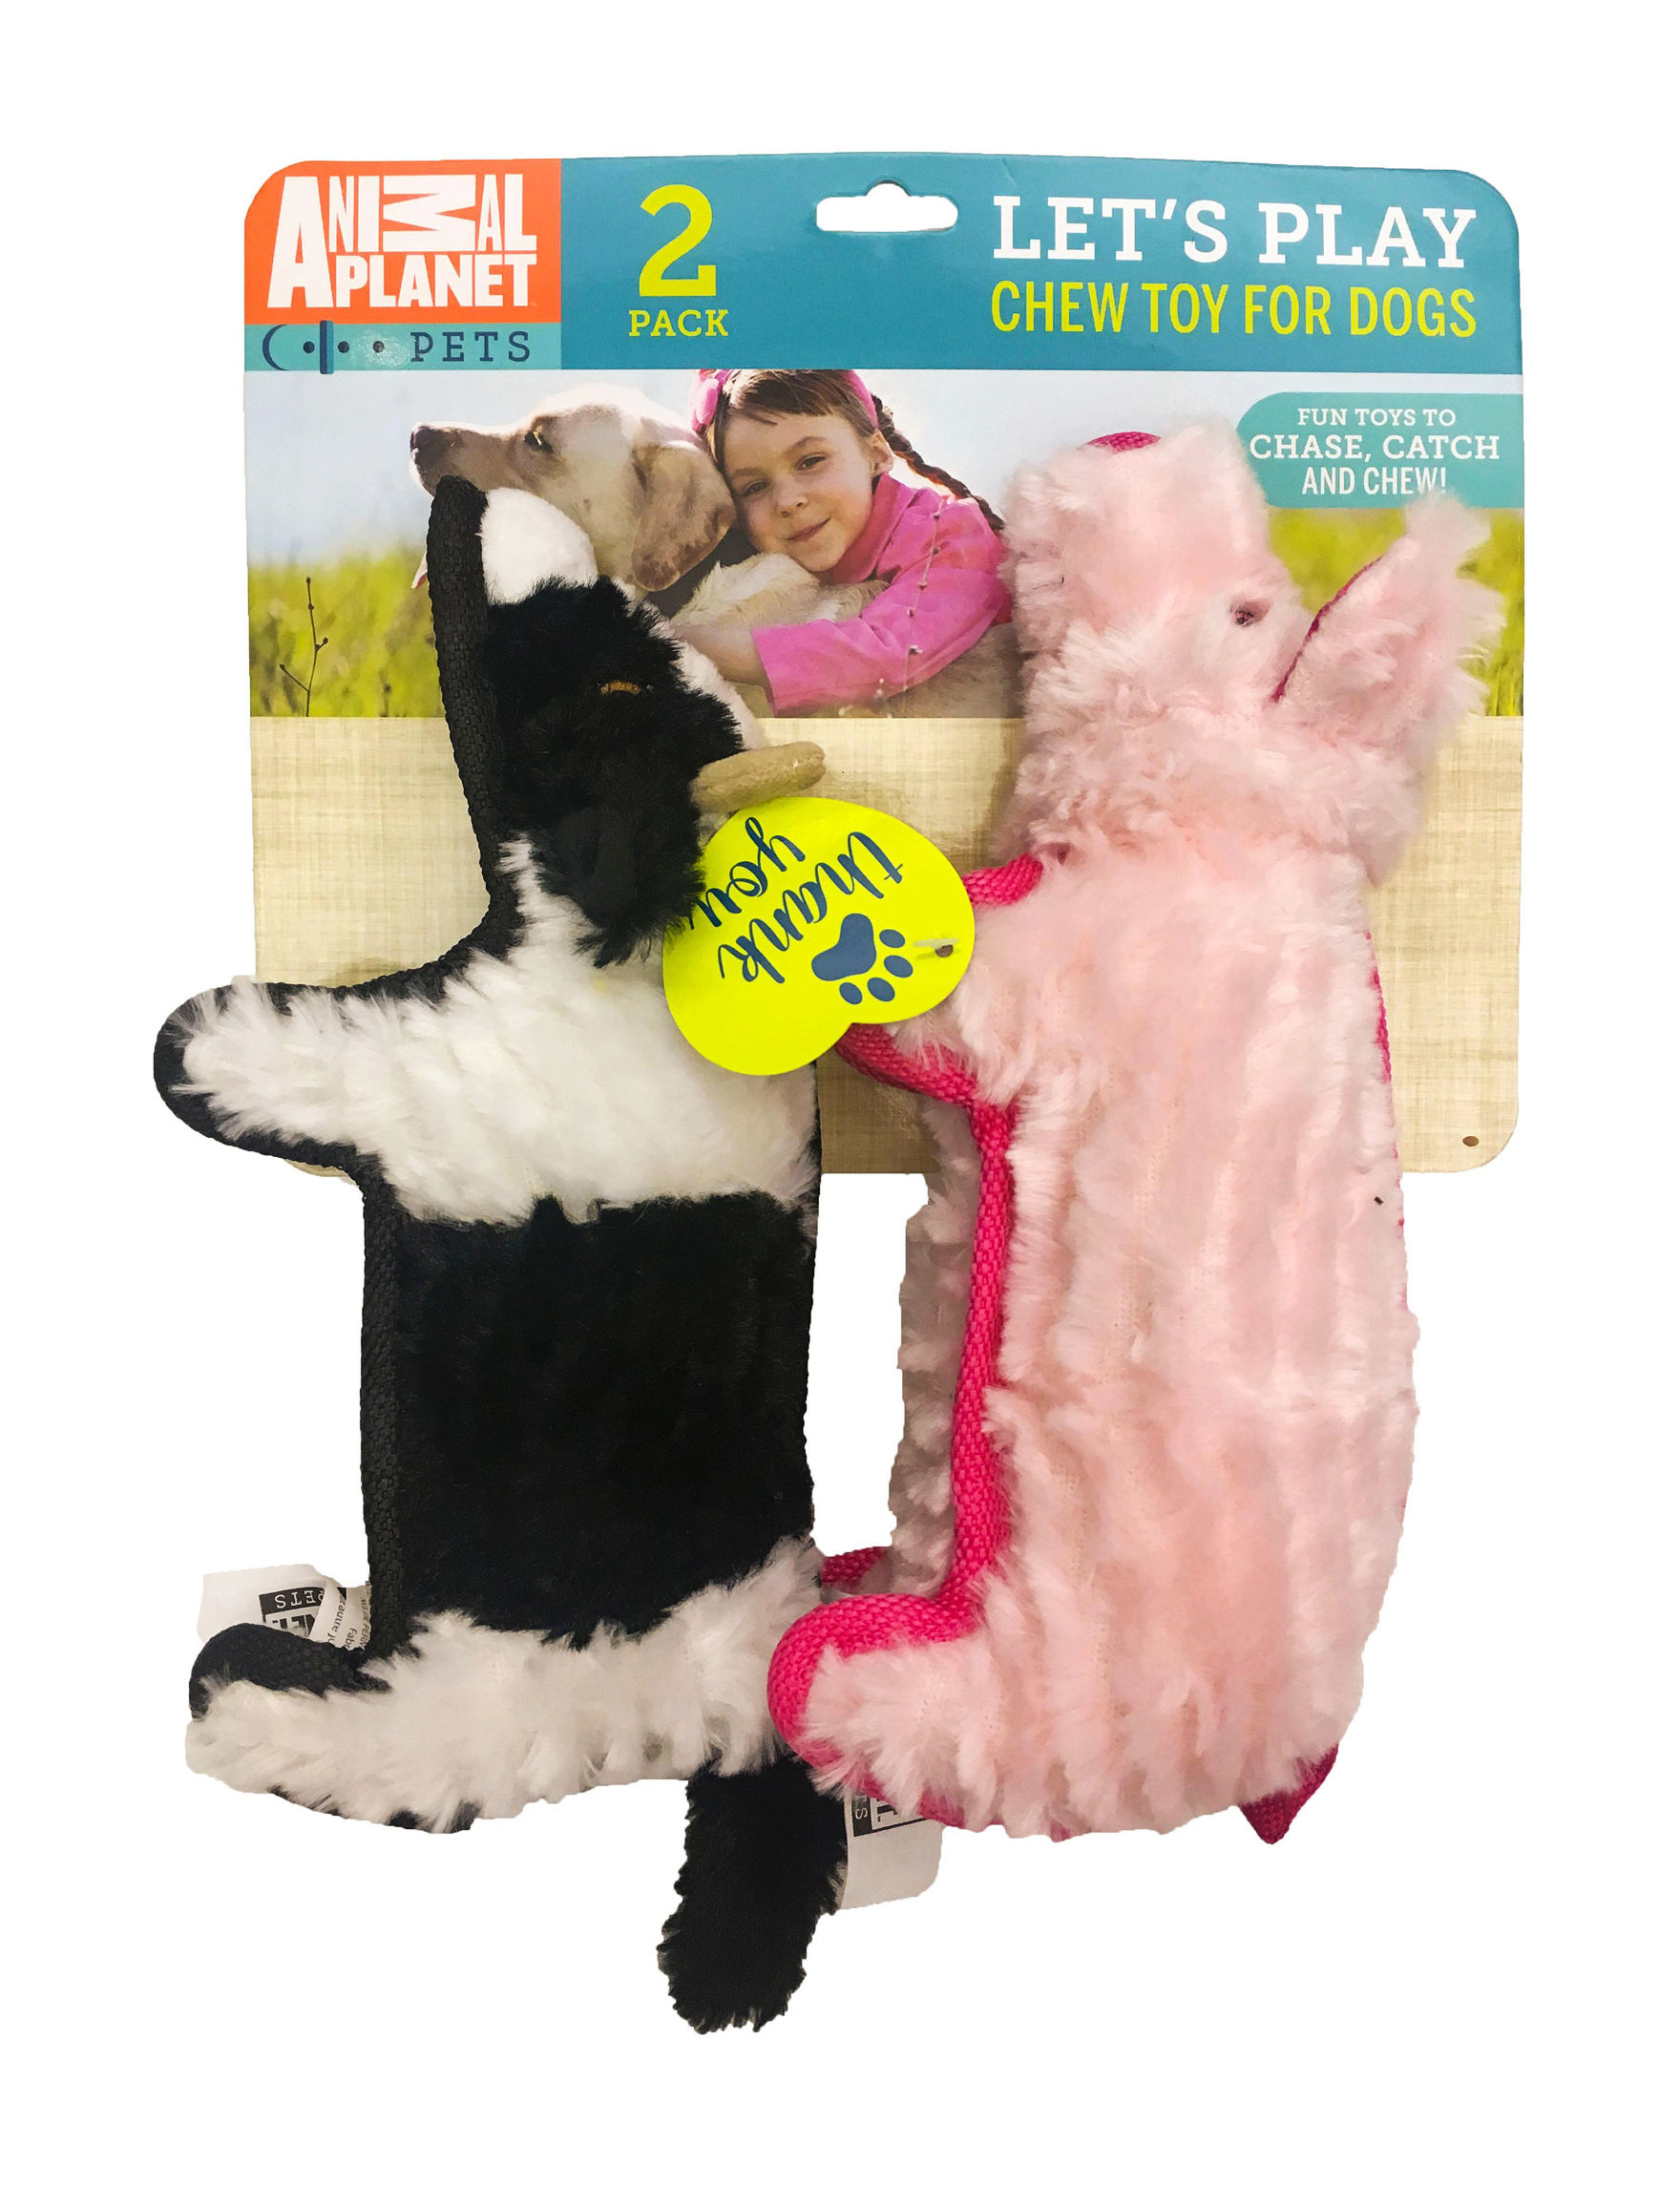 Animal Planet Pink / White / Black Pet Treats & Toys